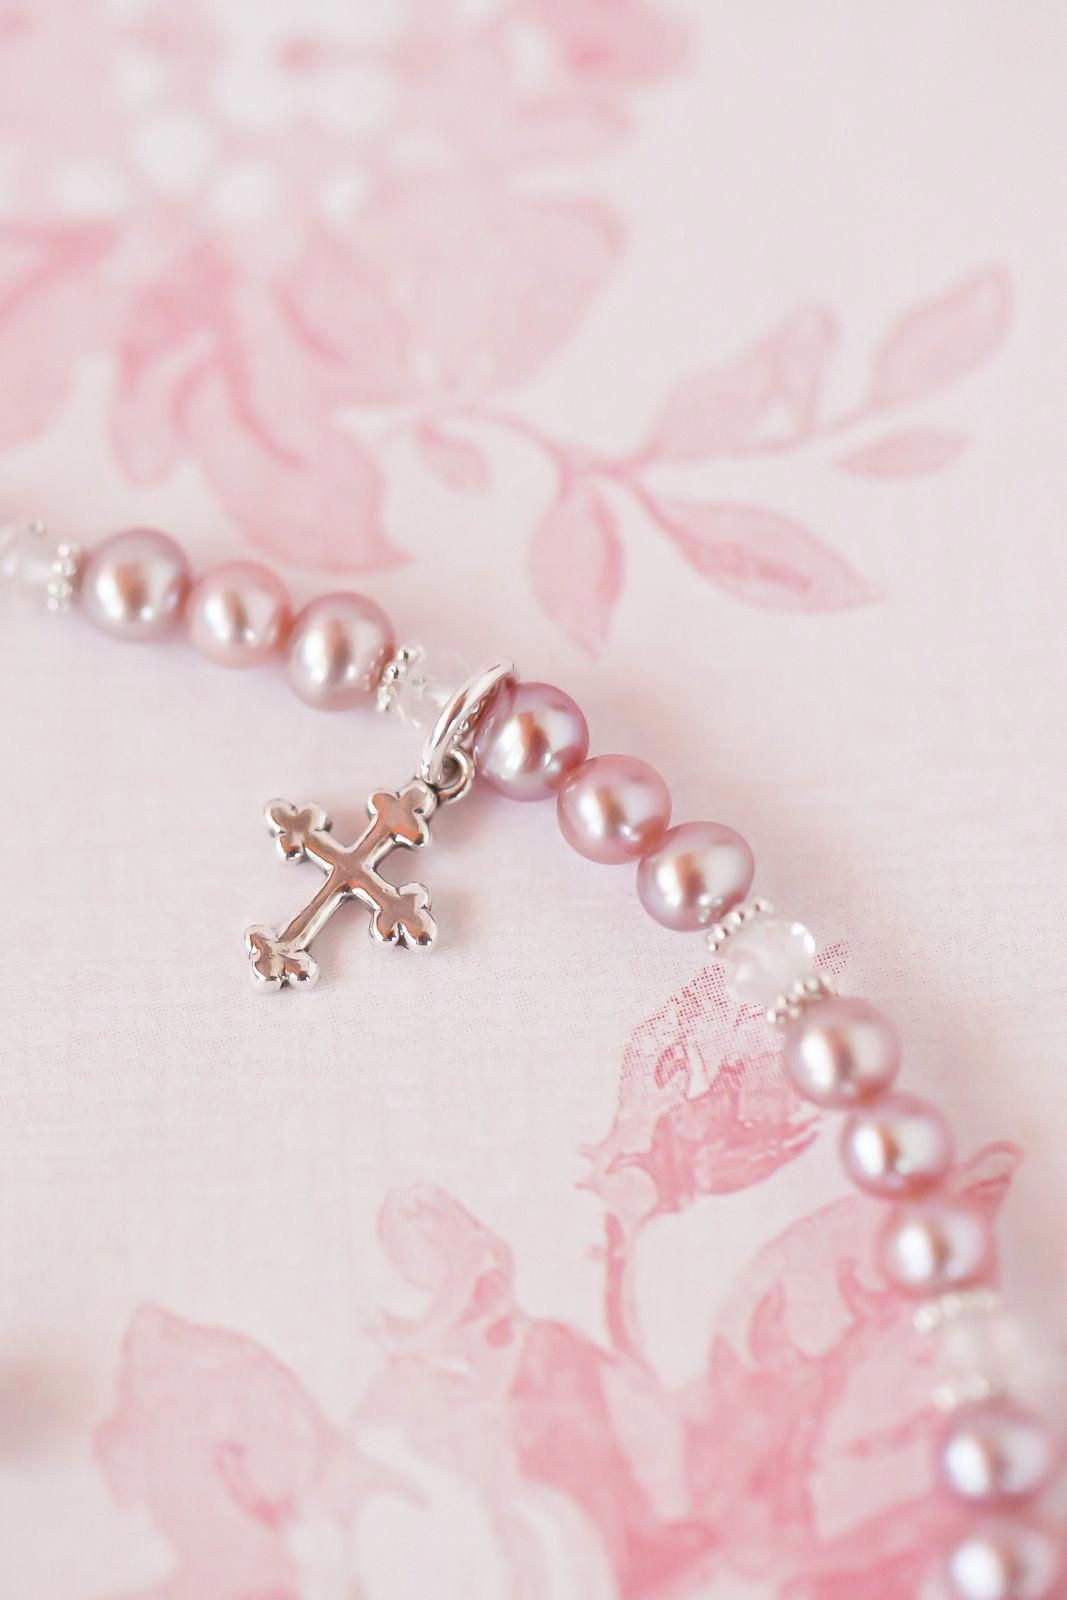 Personalized baby baptism bracelet in modern jewelry